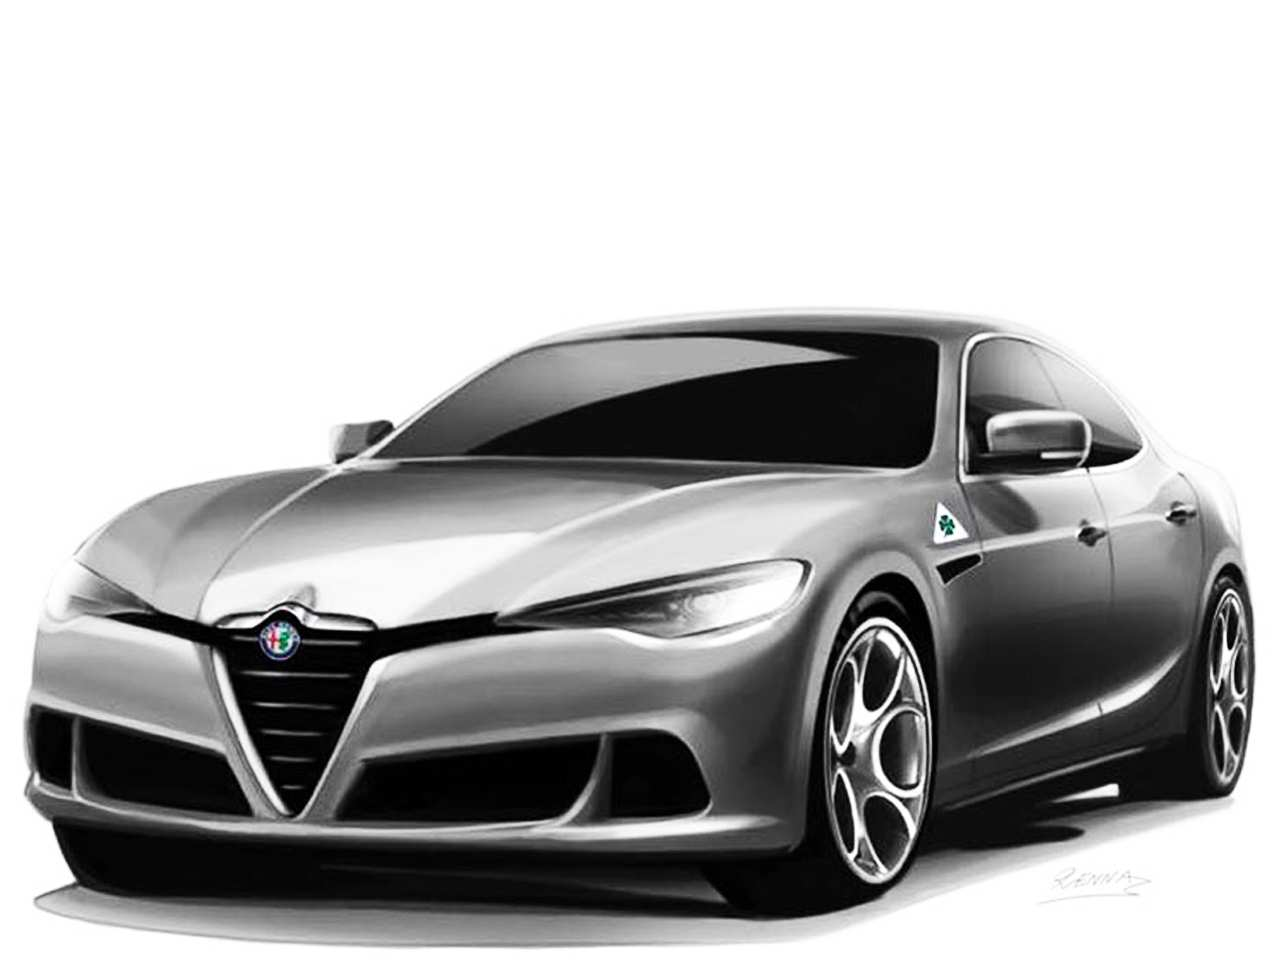 95 Great 2019 Alfa Romeo Alfetta Spesification for 2019 Alfa Romeo Alfetta